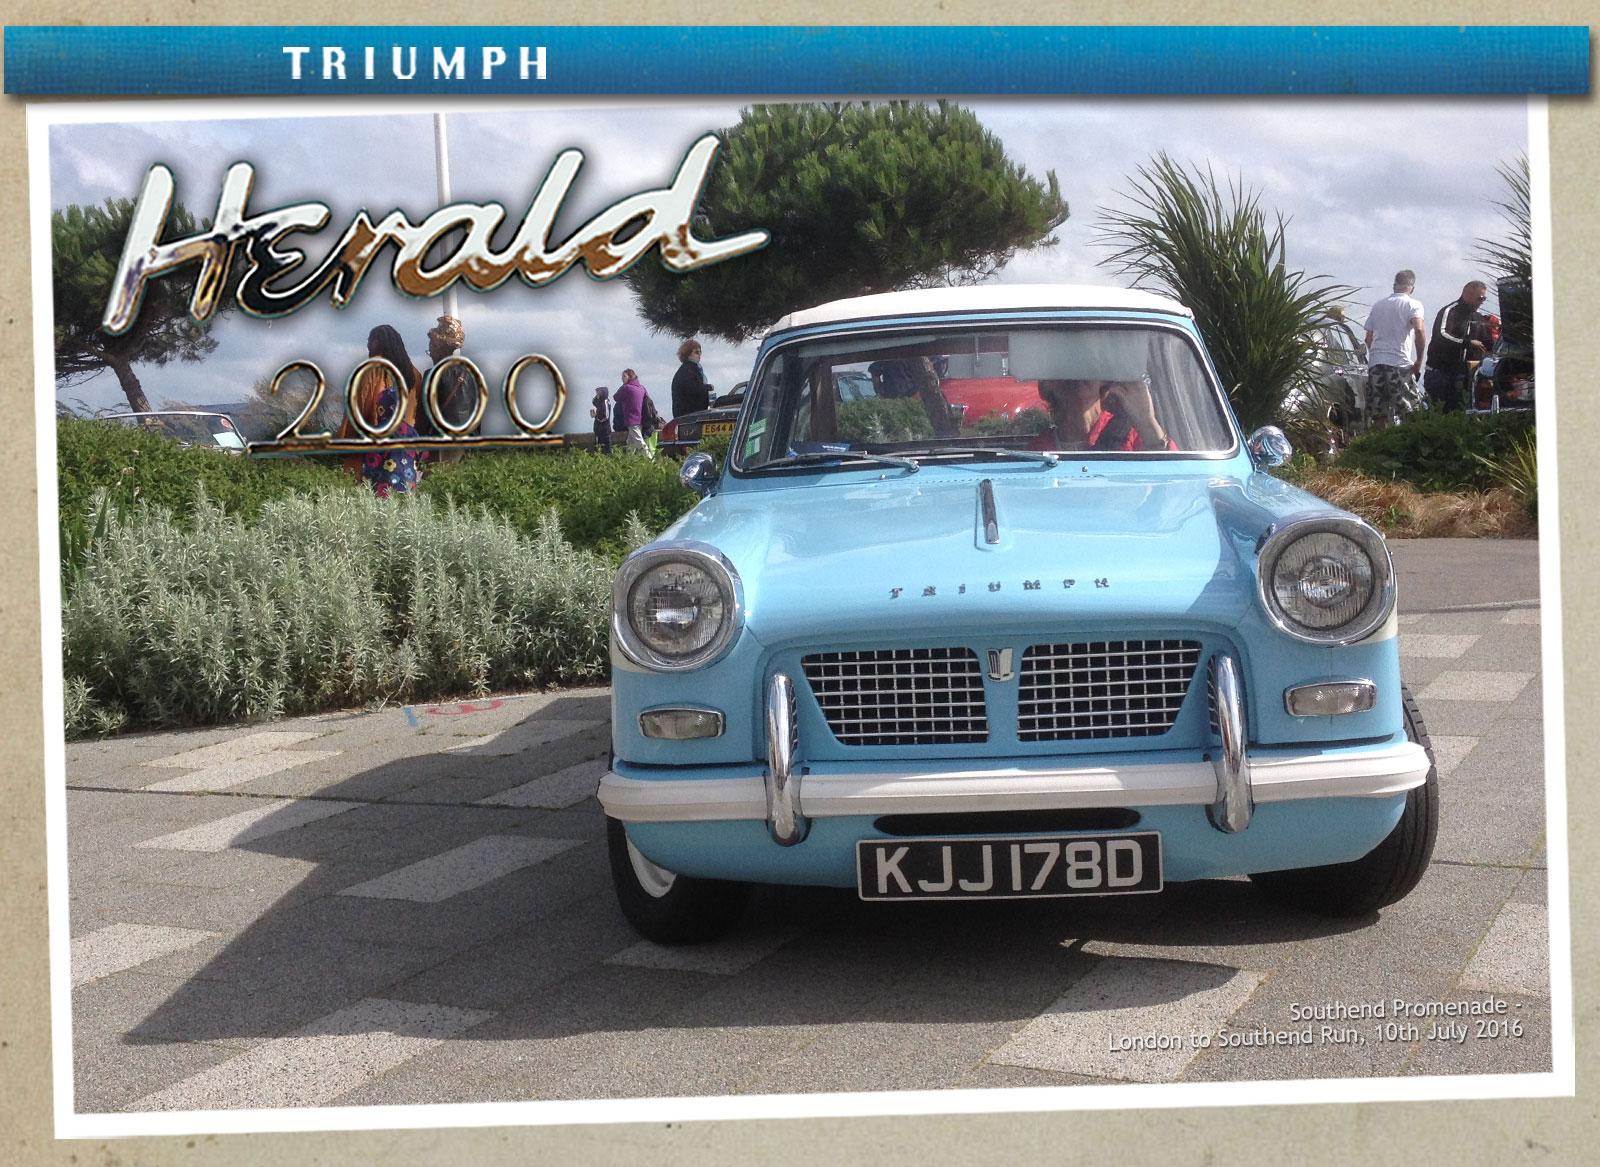 Paul's homage to his Triumph Herald 2000 and Viking Fibreline Caravan